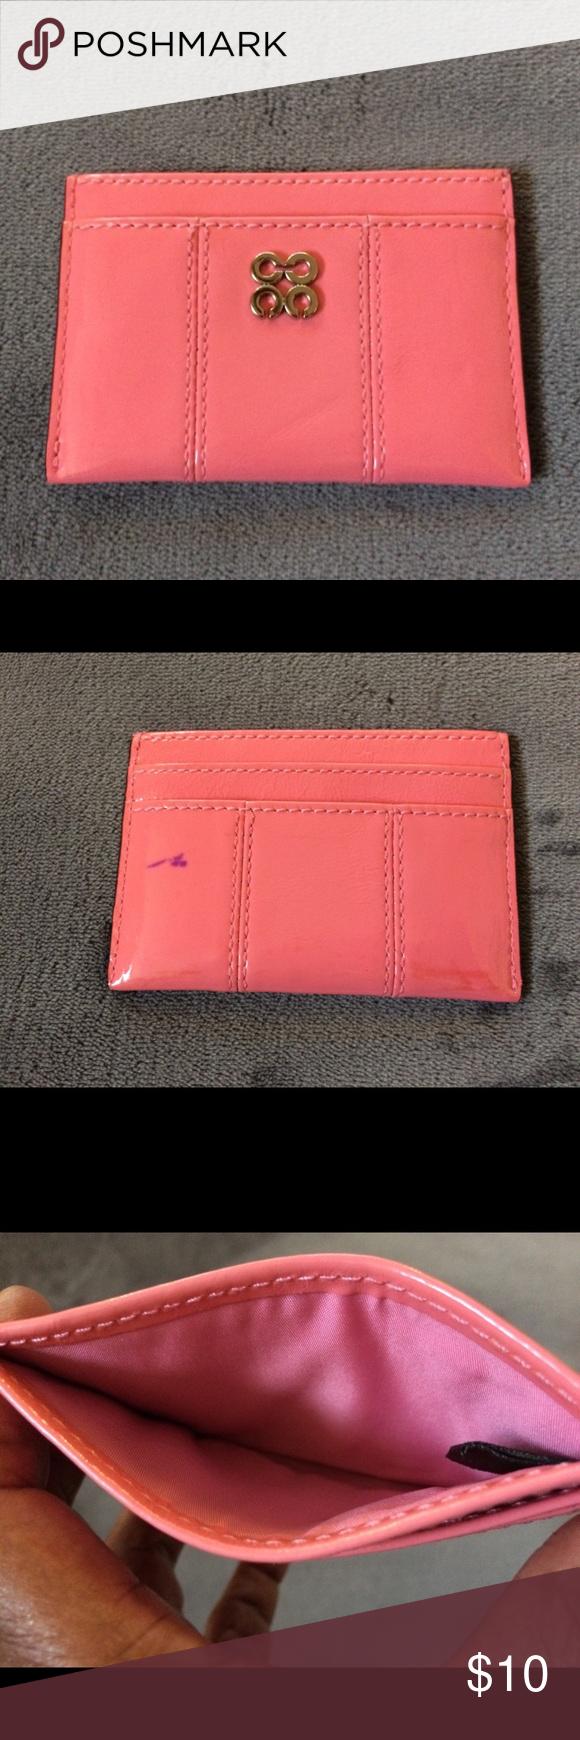 Coach business card holder | Pinterest | Business card holders, Key ...